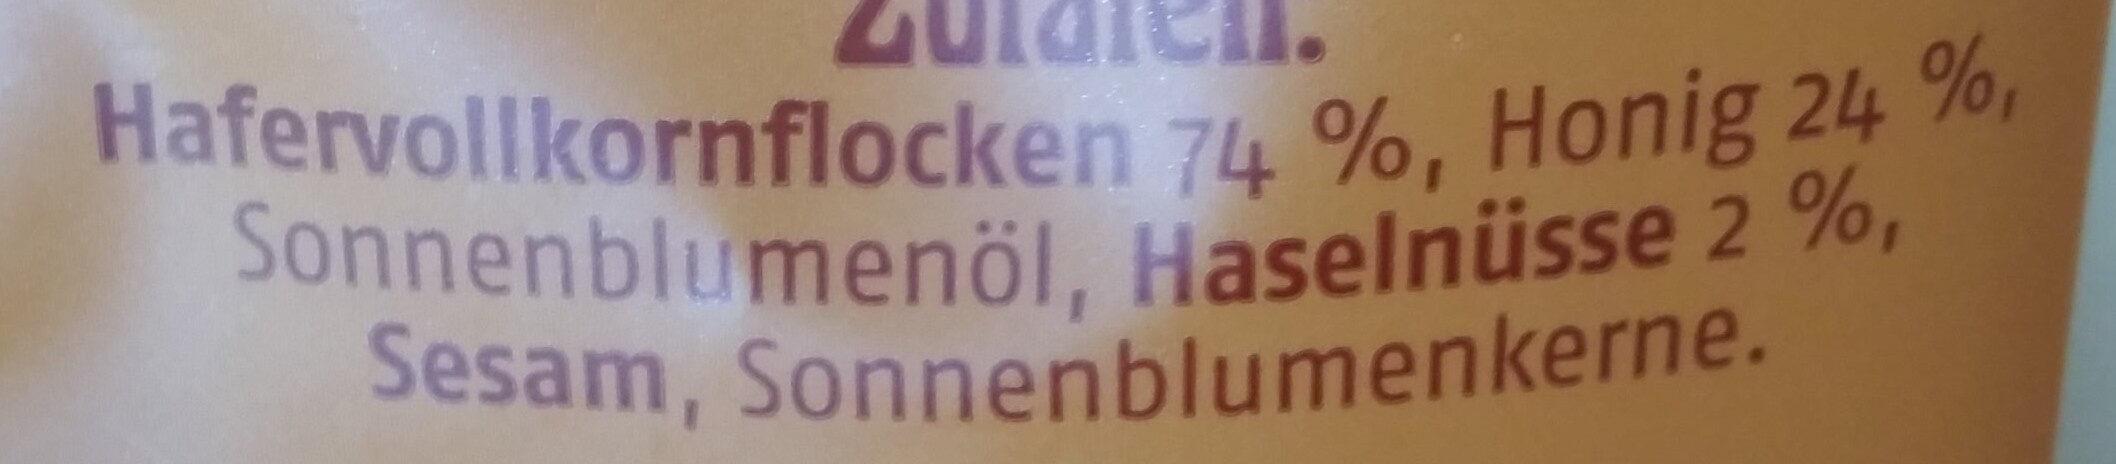 Barnhouse Krunchy Honing Muesli - Zutaten - de